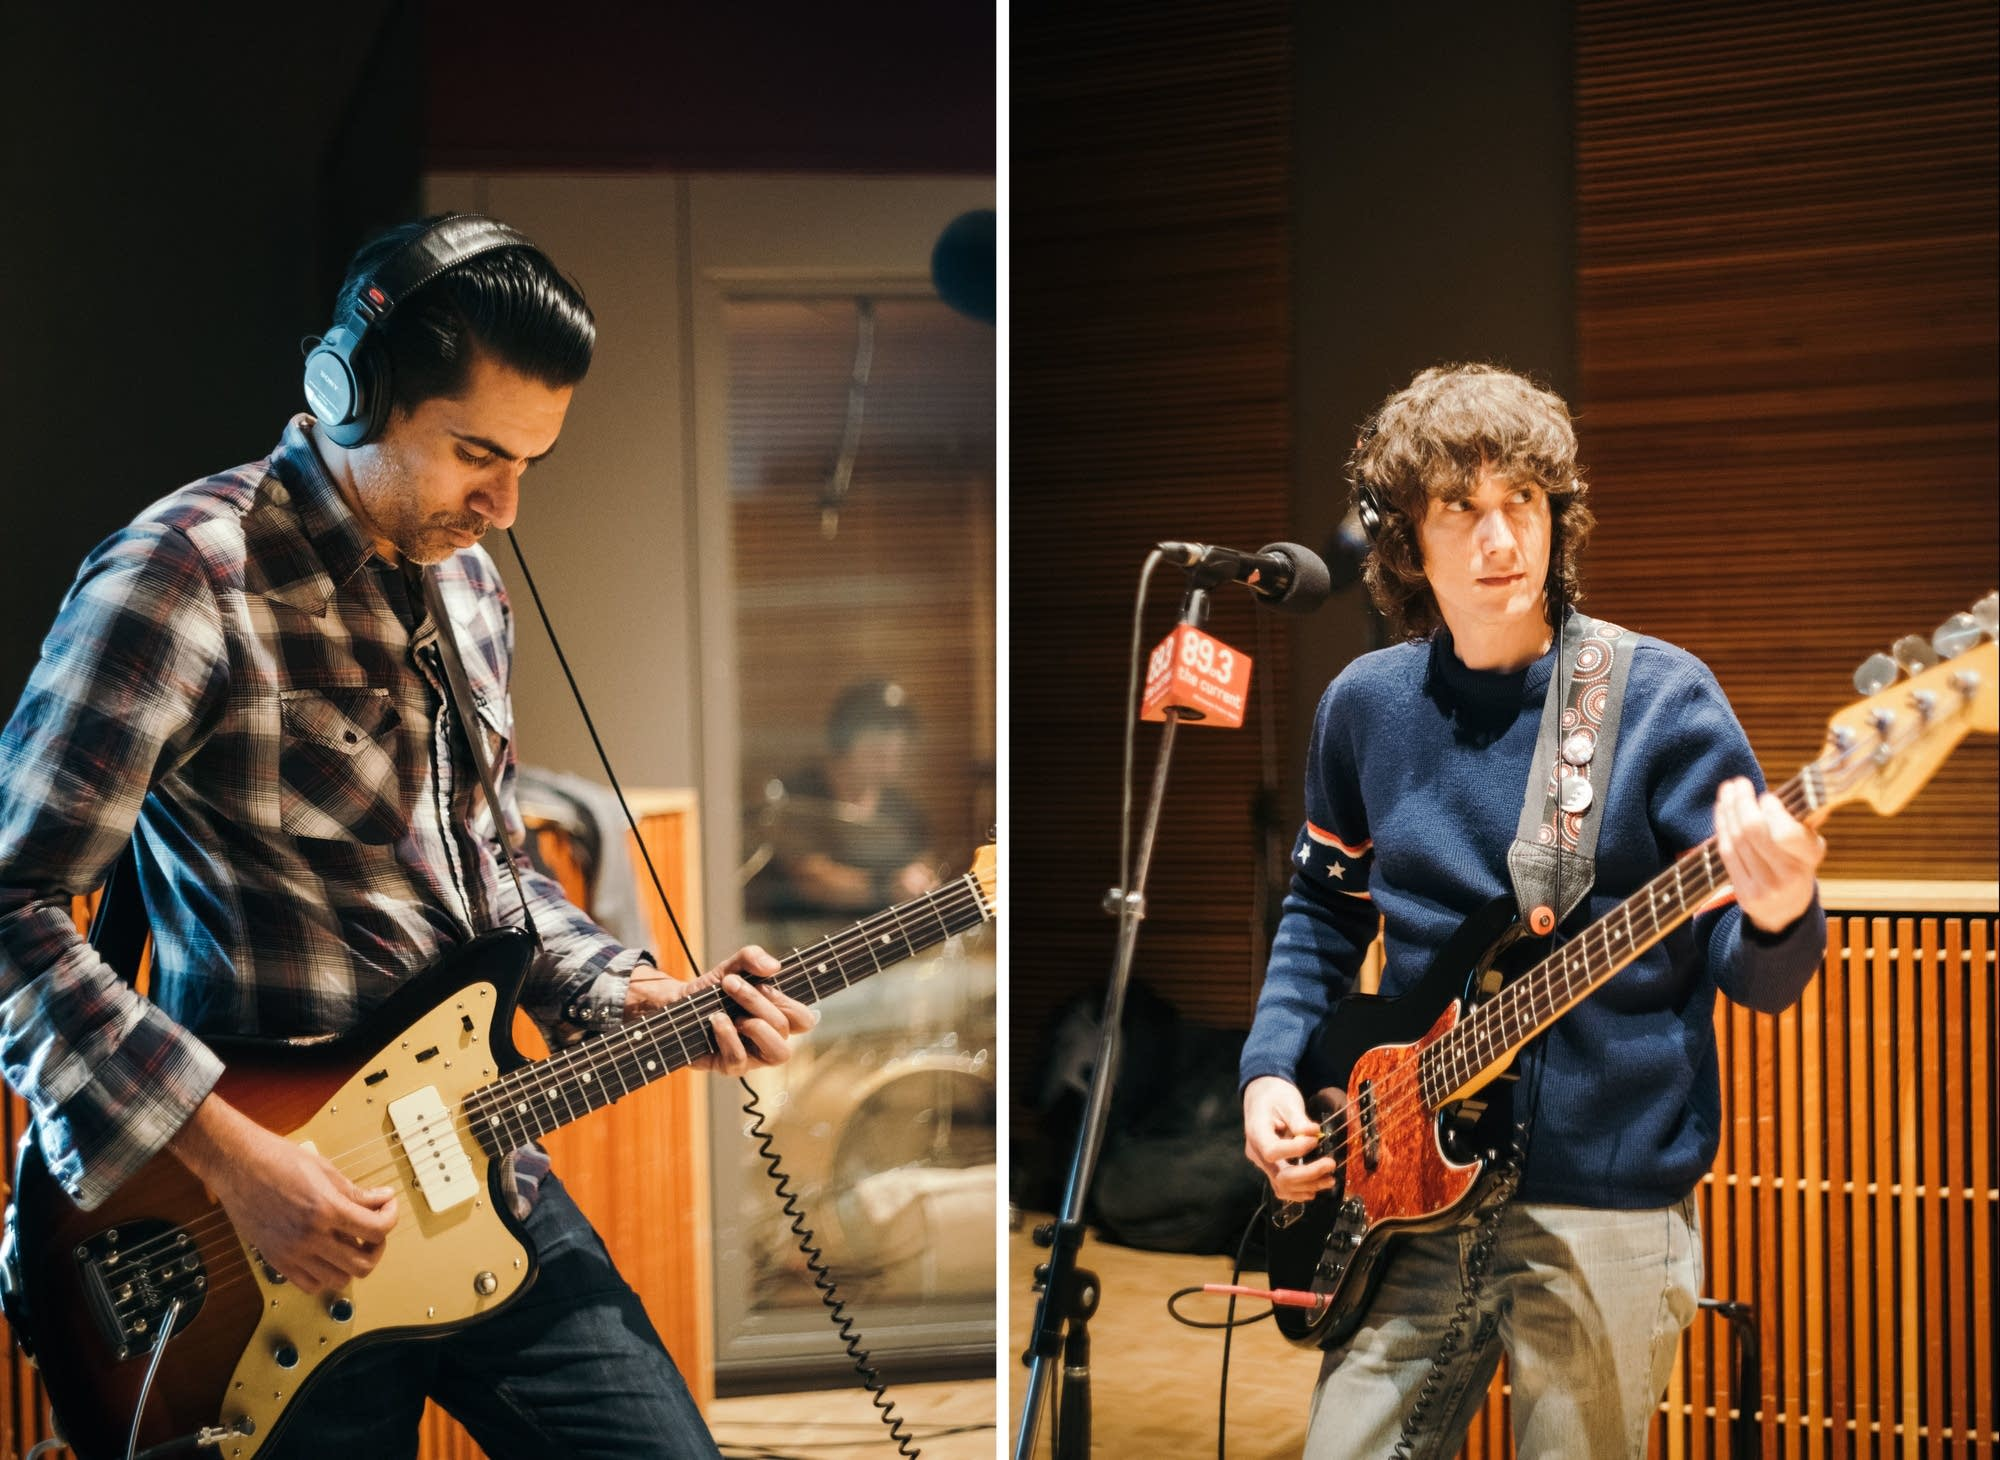 Lead guitarist Arun Bali and bassist Will Berman